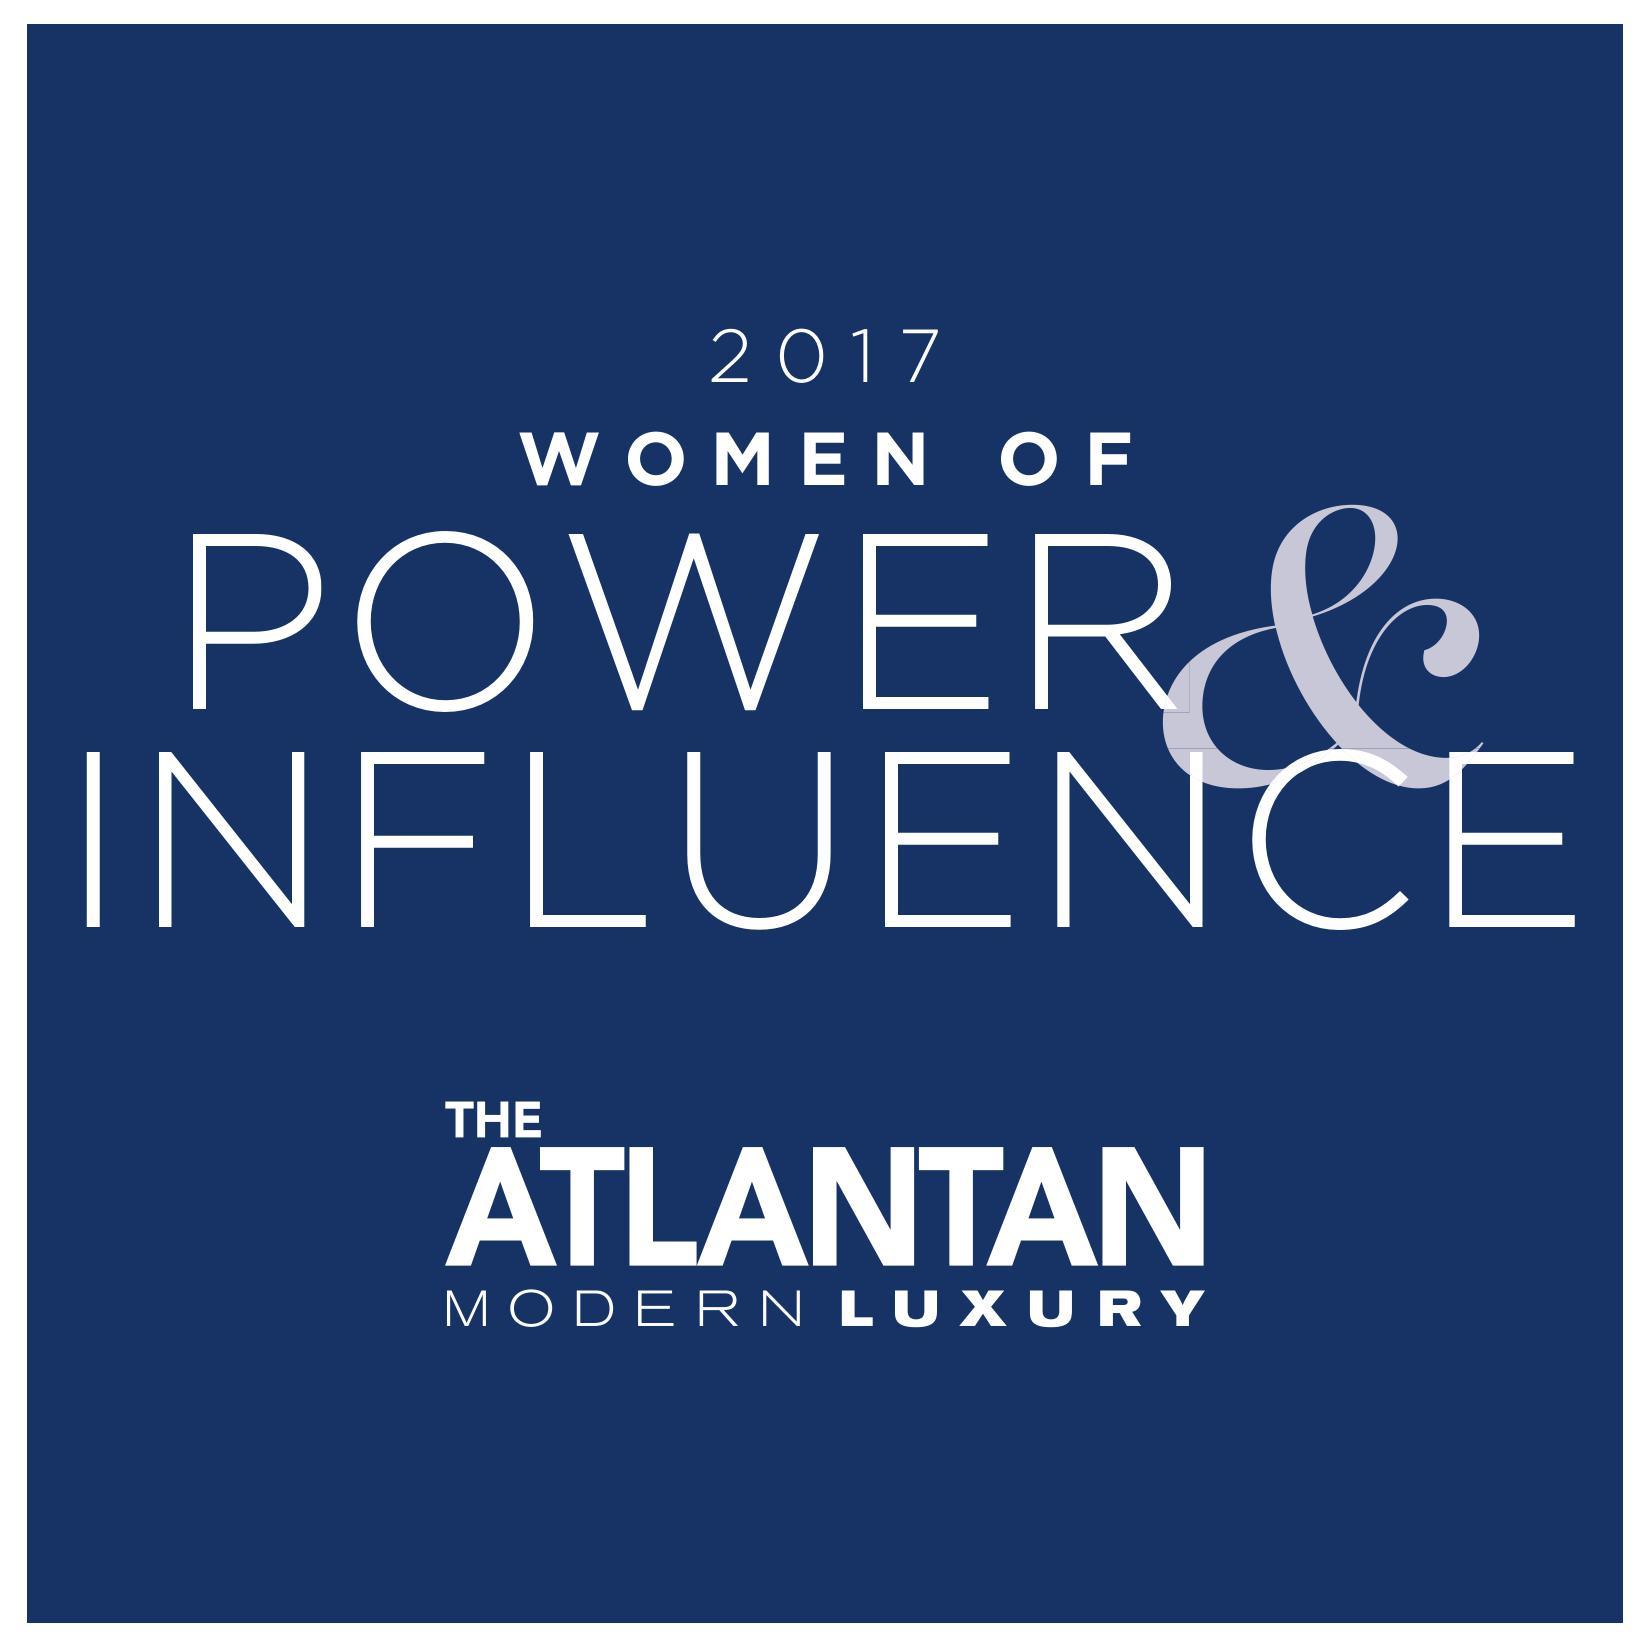 Atlantan Magazine Women of Power Influence